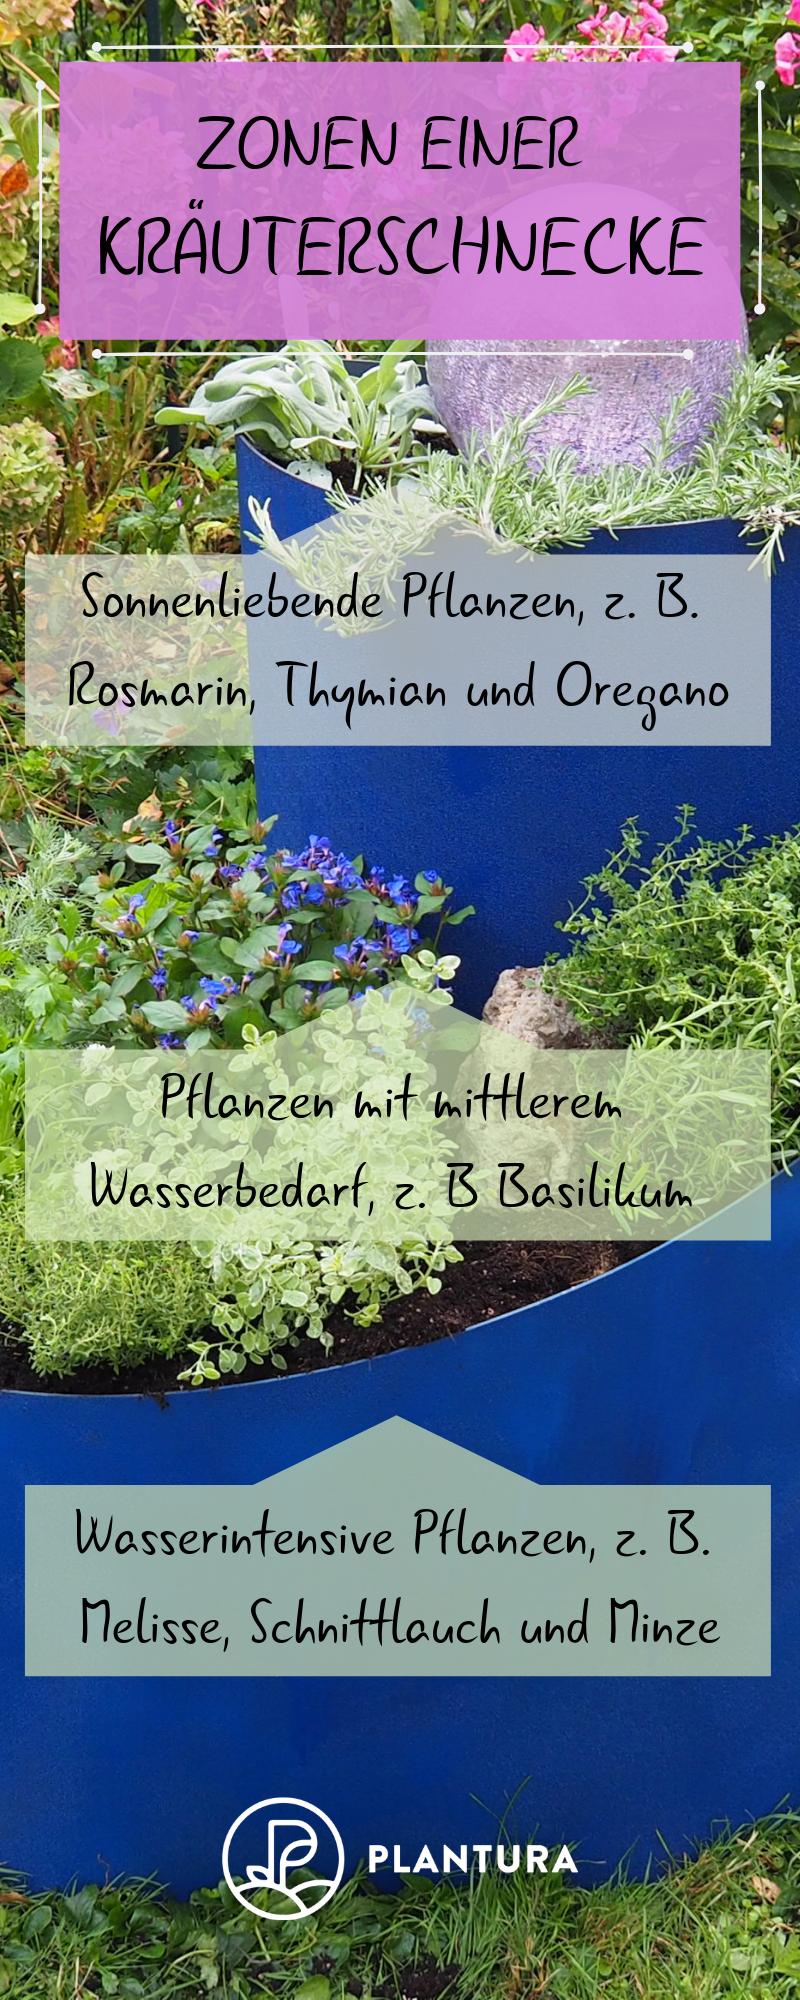 Kräuterschnecke in 10 Minuten anlegen: Video & Tipps – Plantura  – Kräutergarten: Kräuter anpflanzen